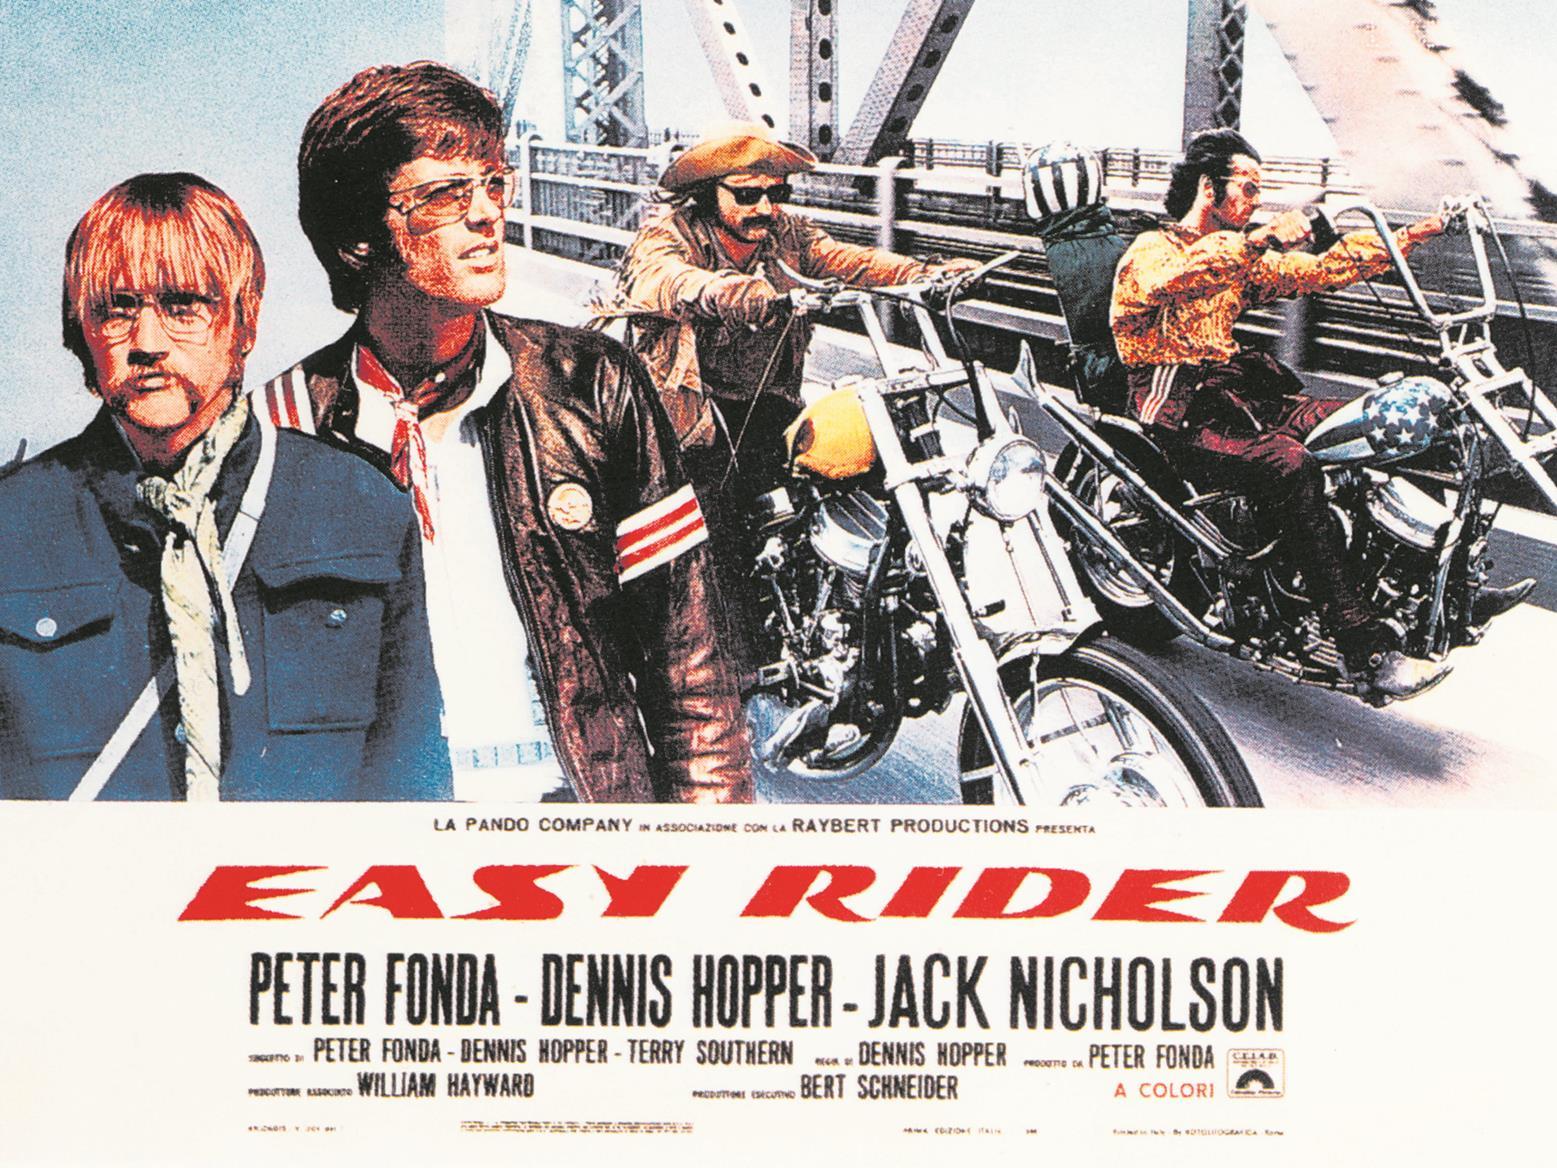 Original Easy Rider film poster